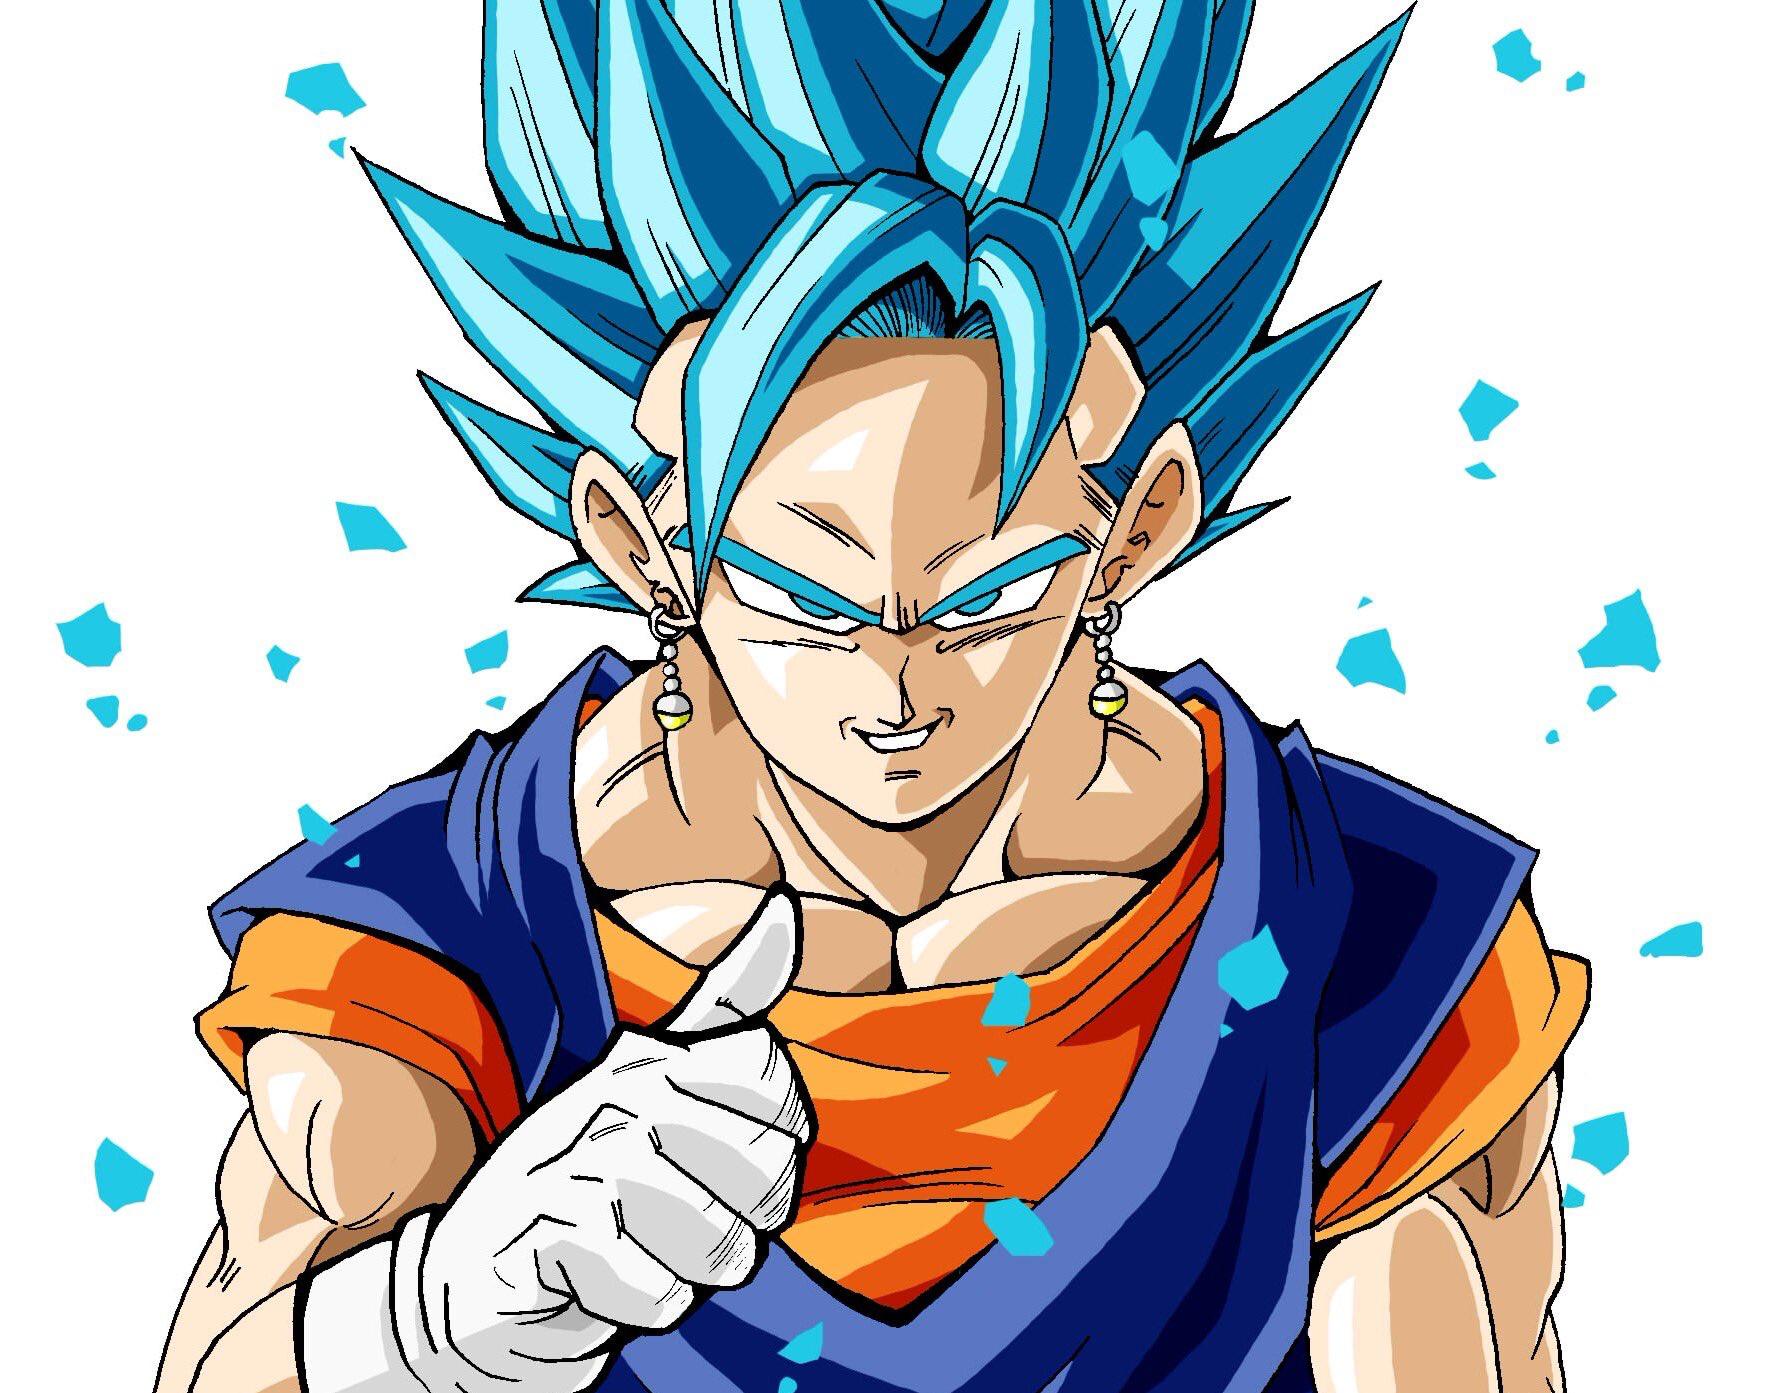 Bejito Ssgss Dragon Ball Z Dragon Ball Gt Dragon Ball Super